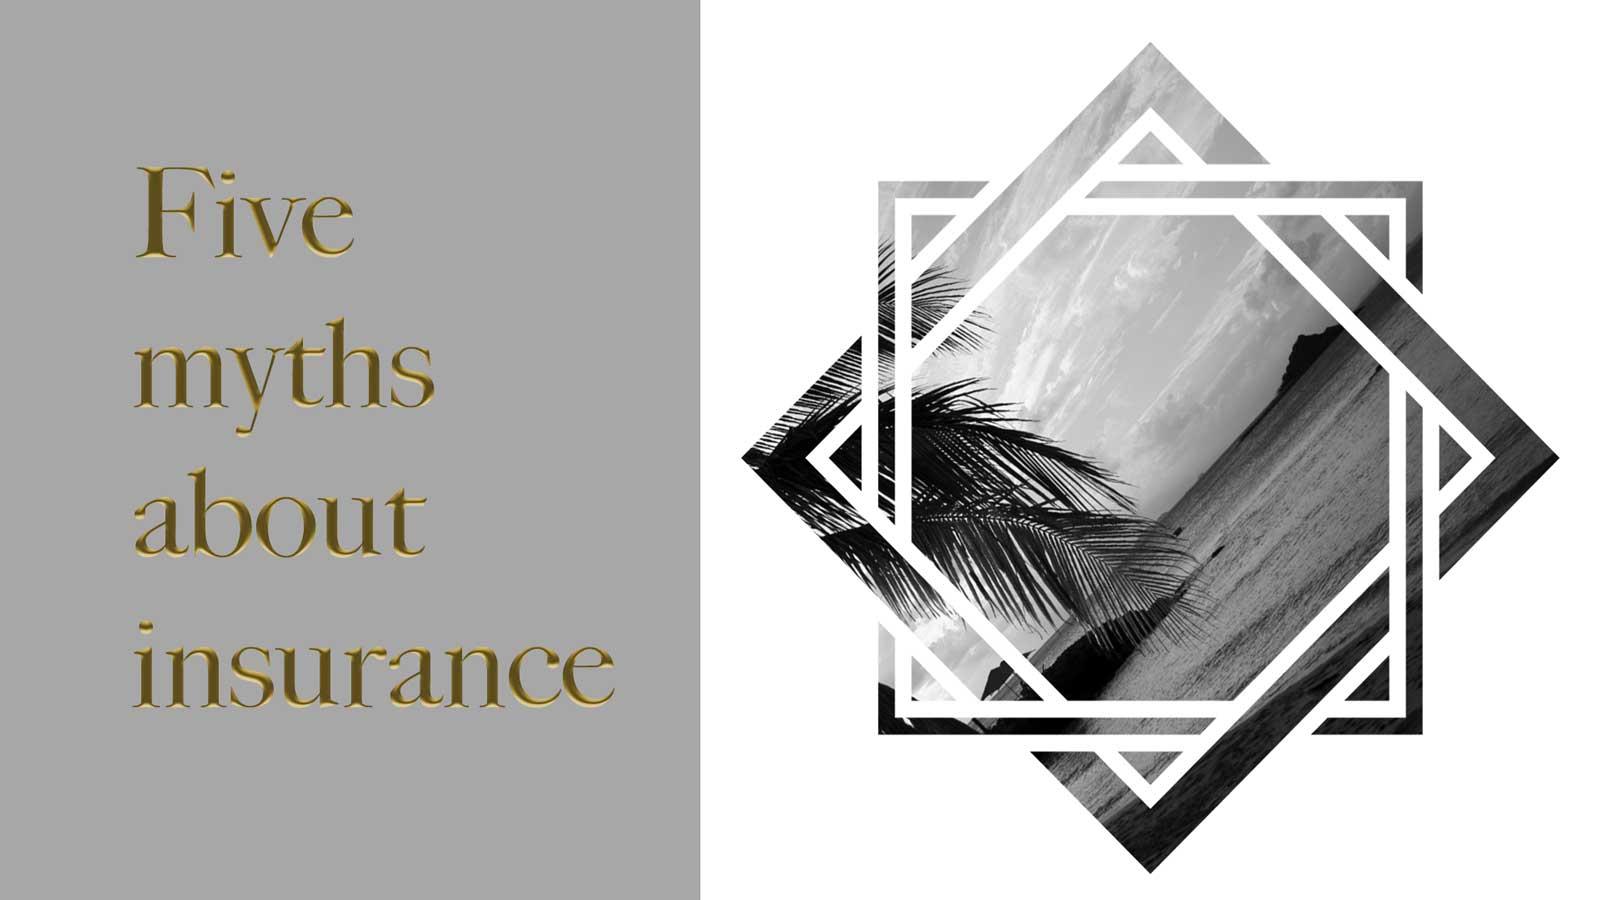 5 myths about insurance